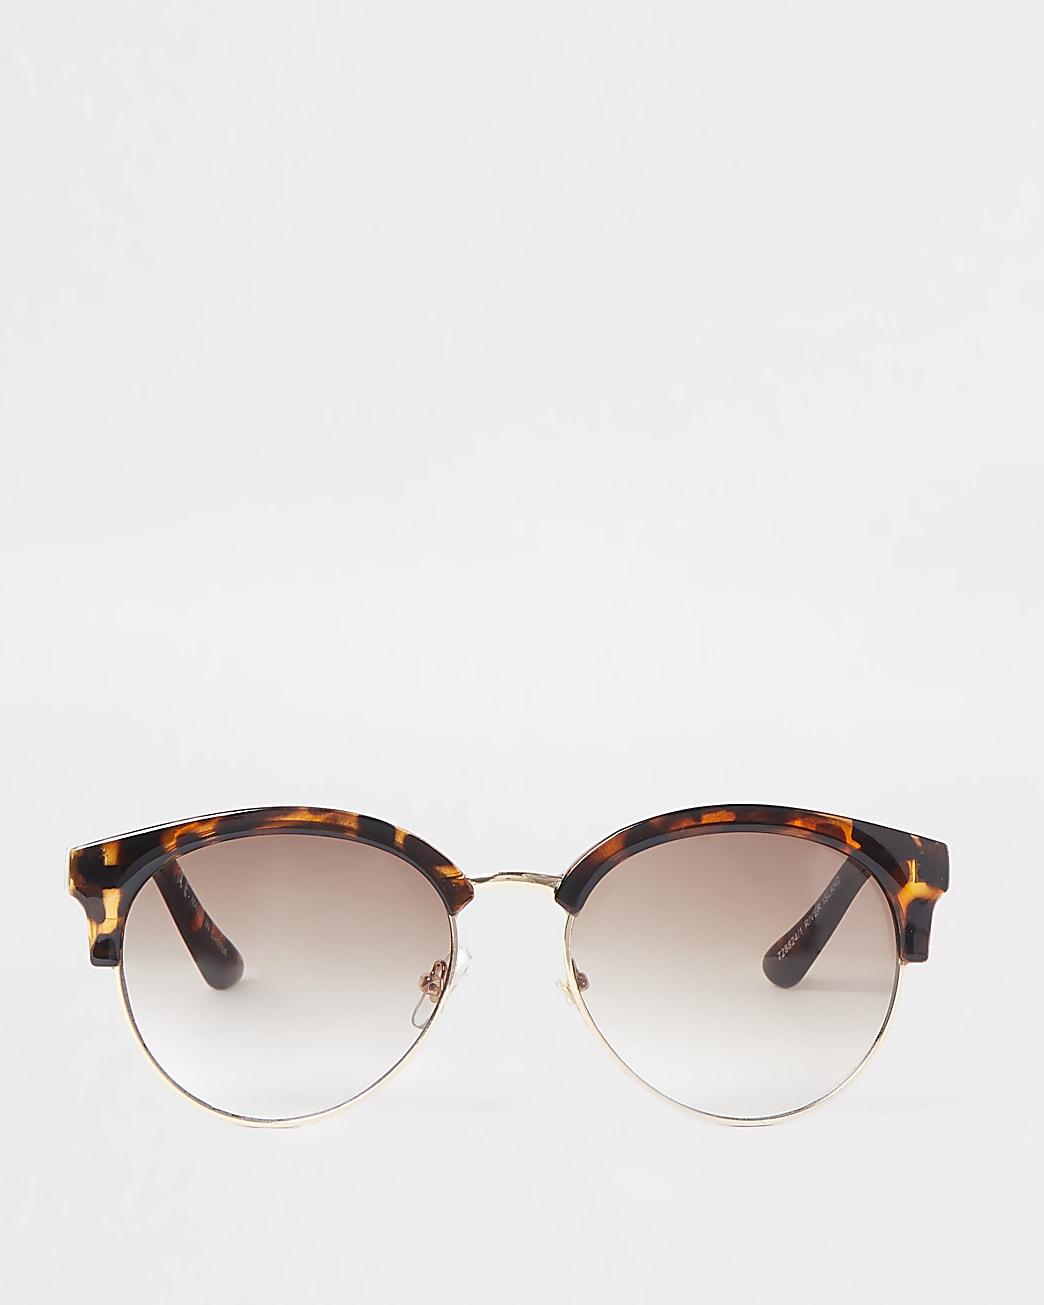 Brown tortoiseshell chain trim sunglasses